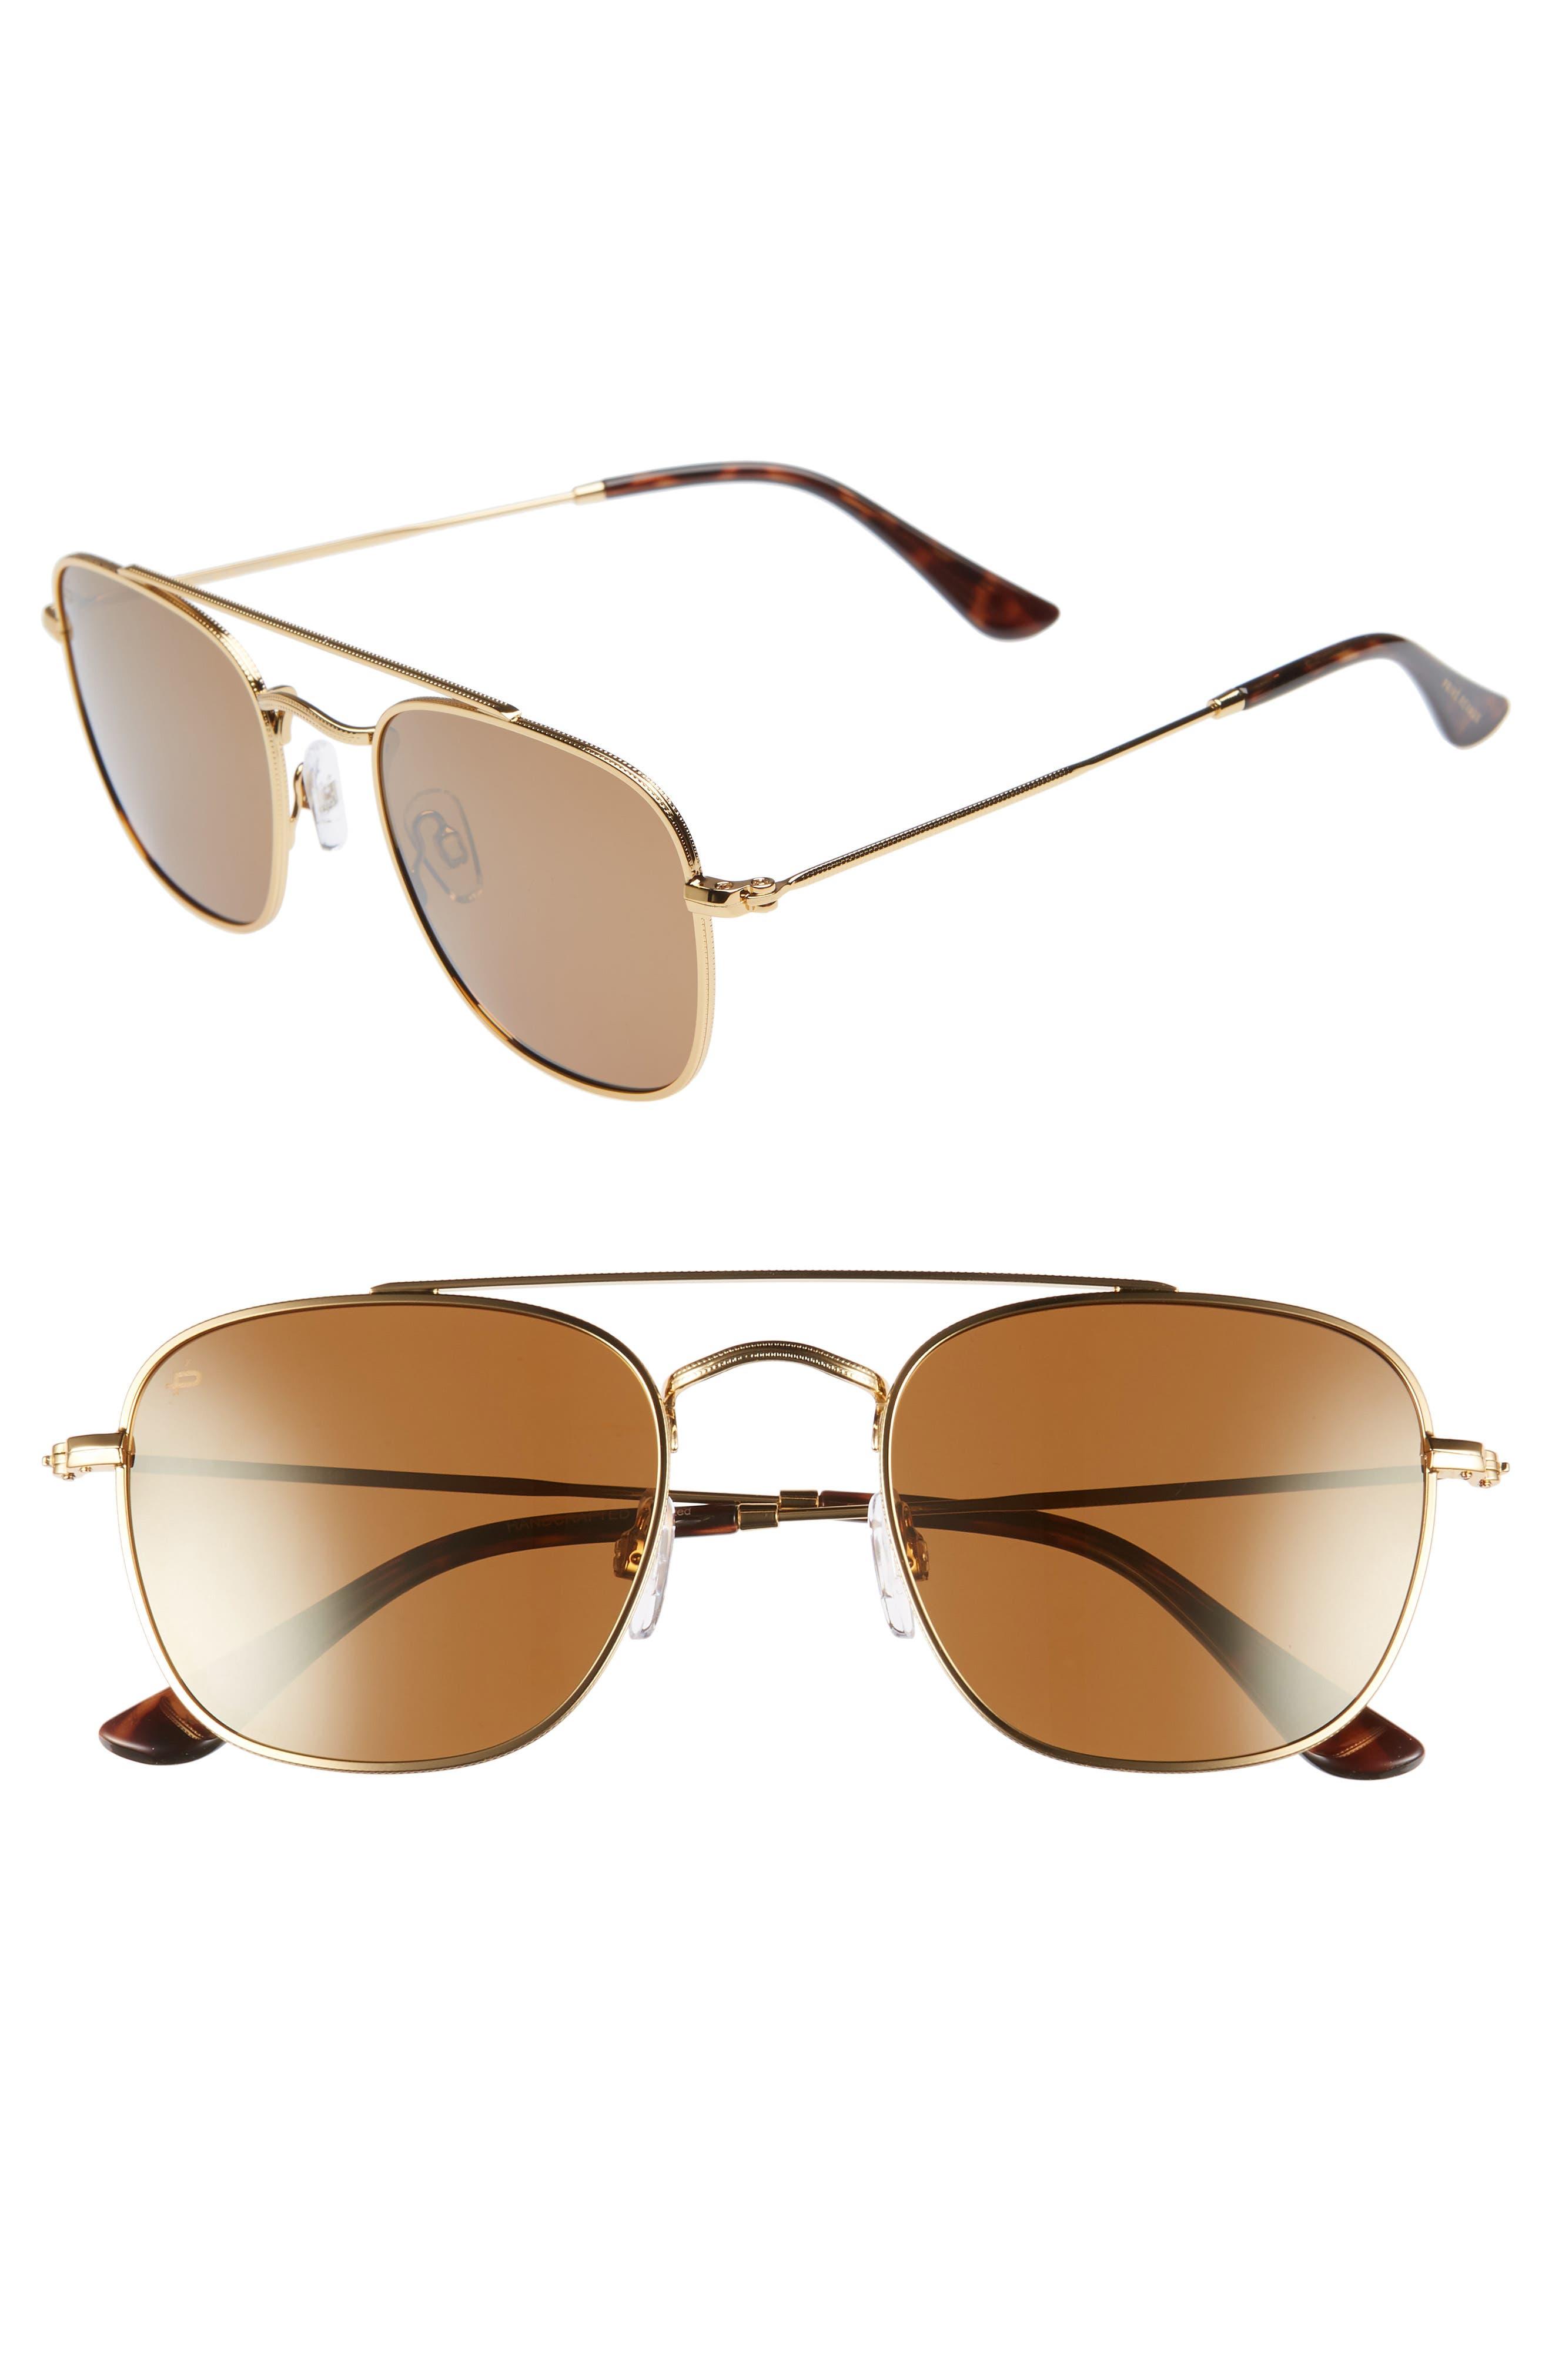 Privé Revaux The Yorker 54mm Sunglasses,                         Main,                         color, HEAVY GOLD